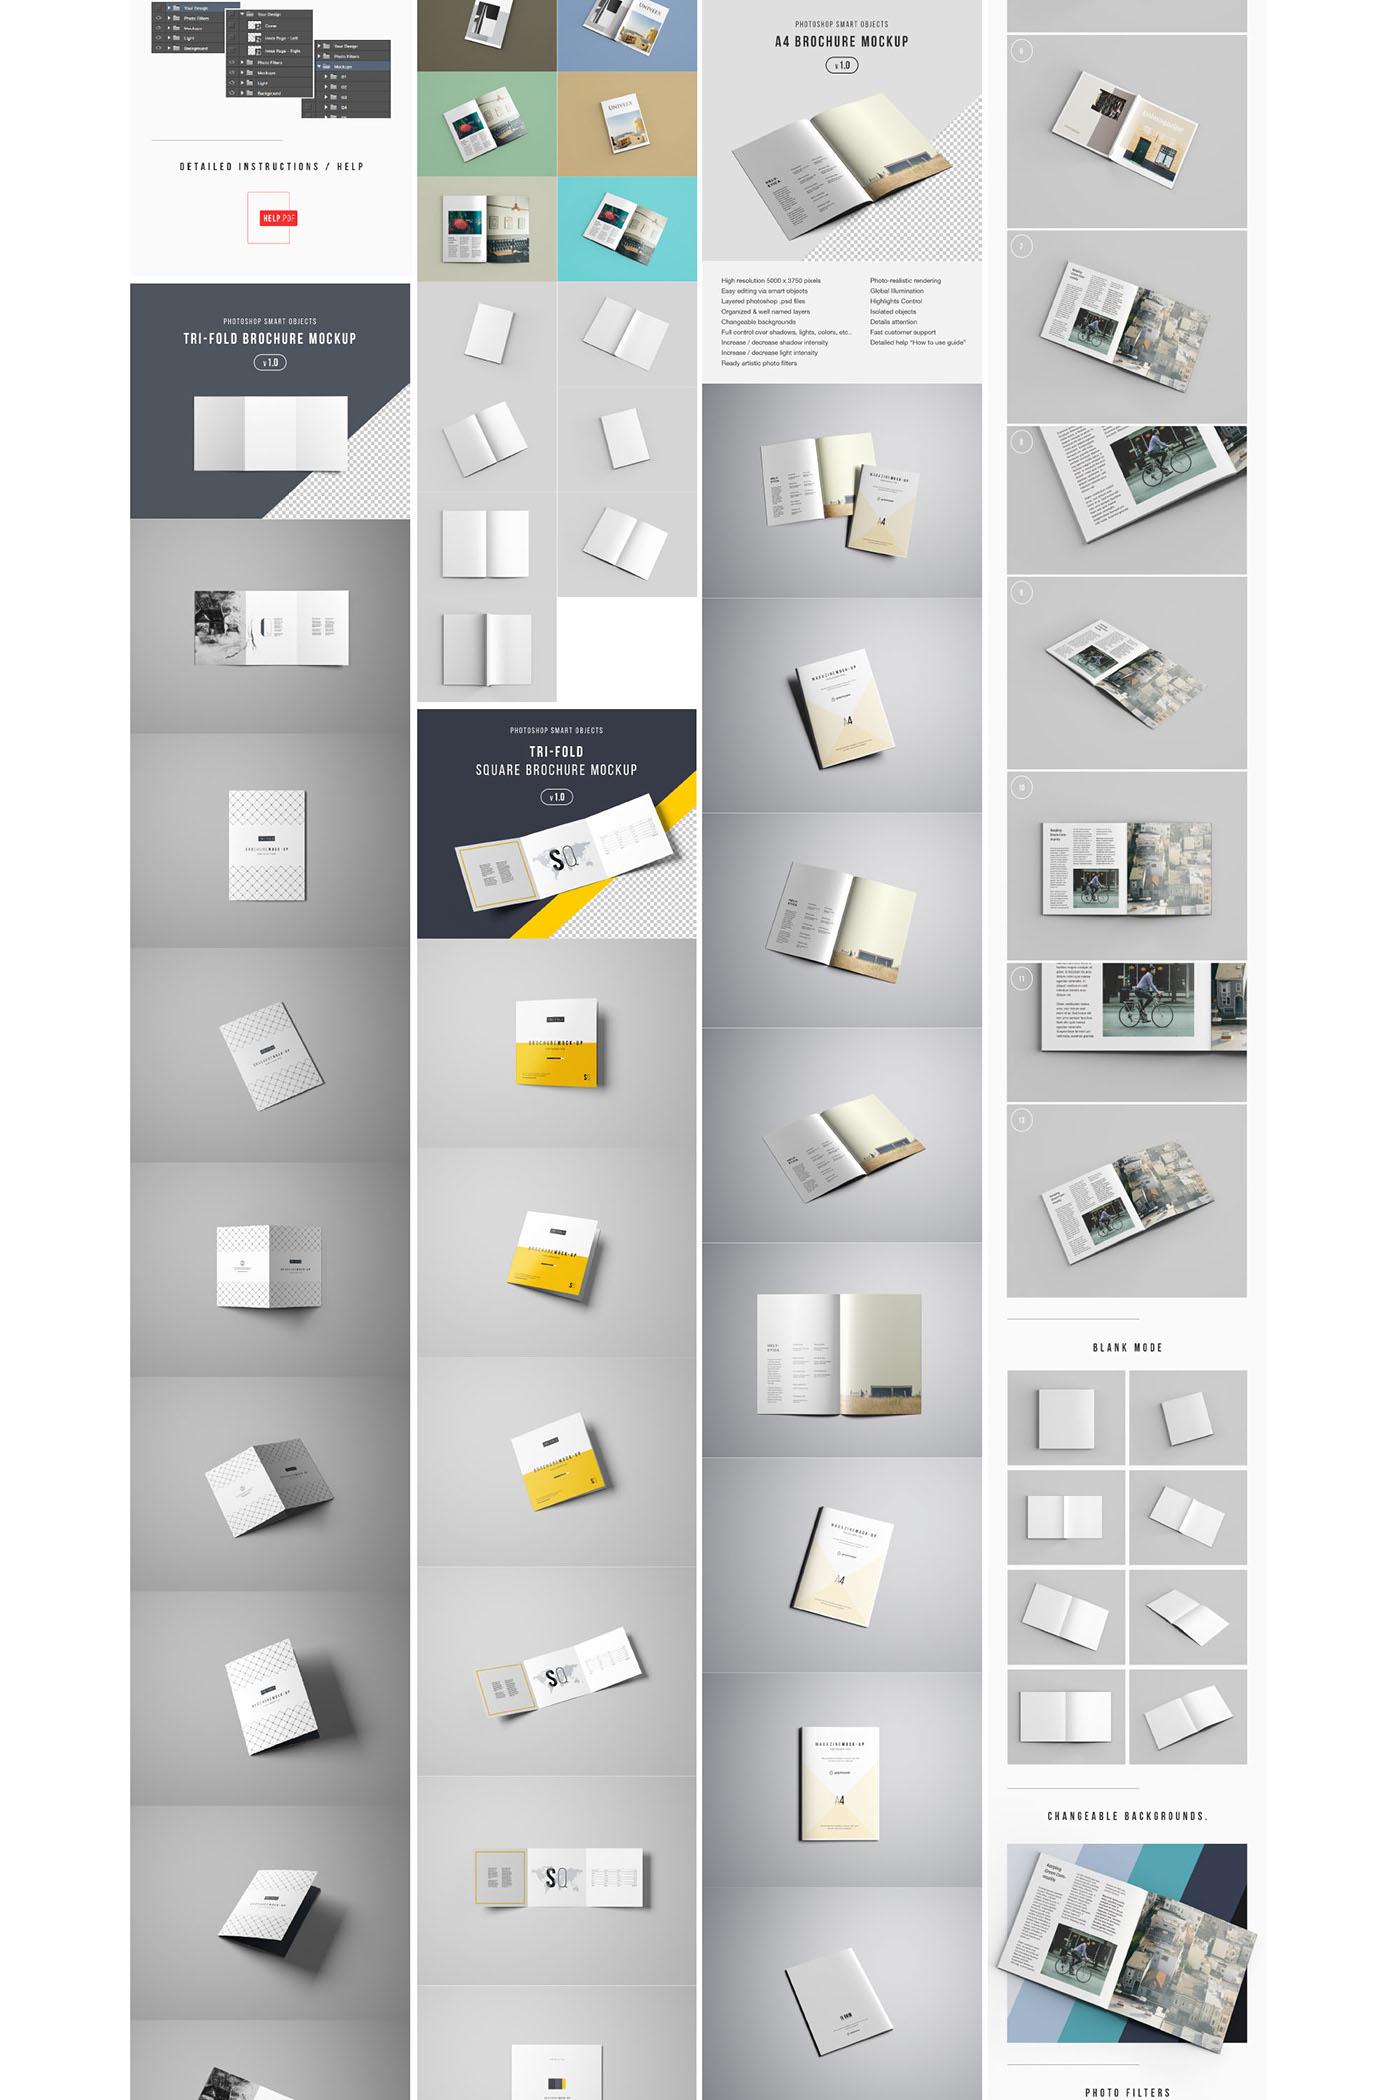 mockups fonts download free icons graphics art design